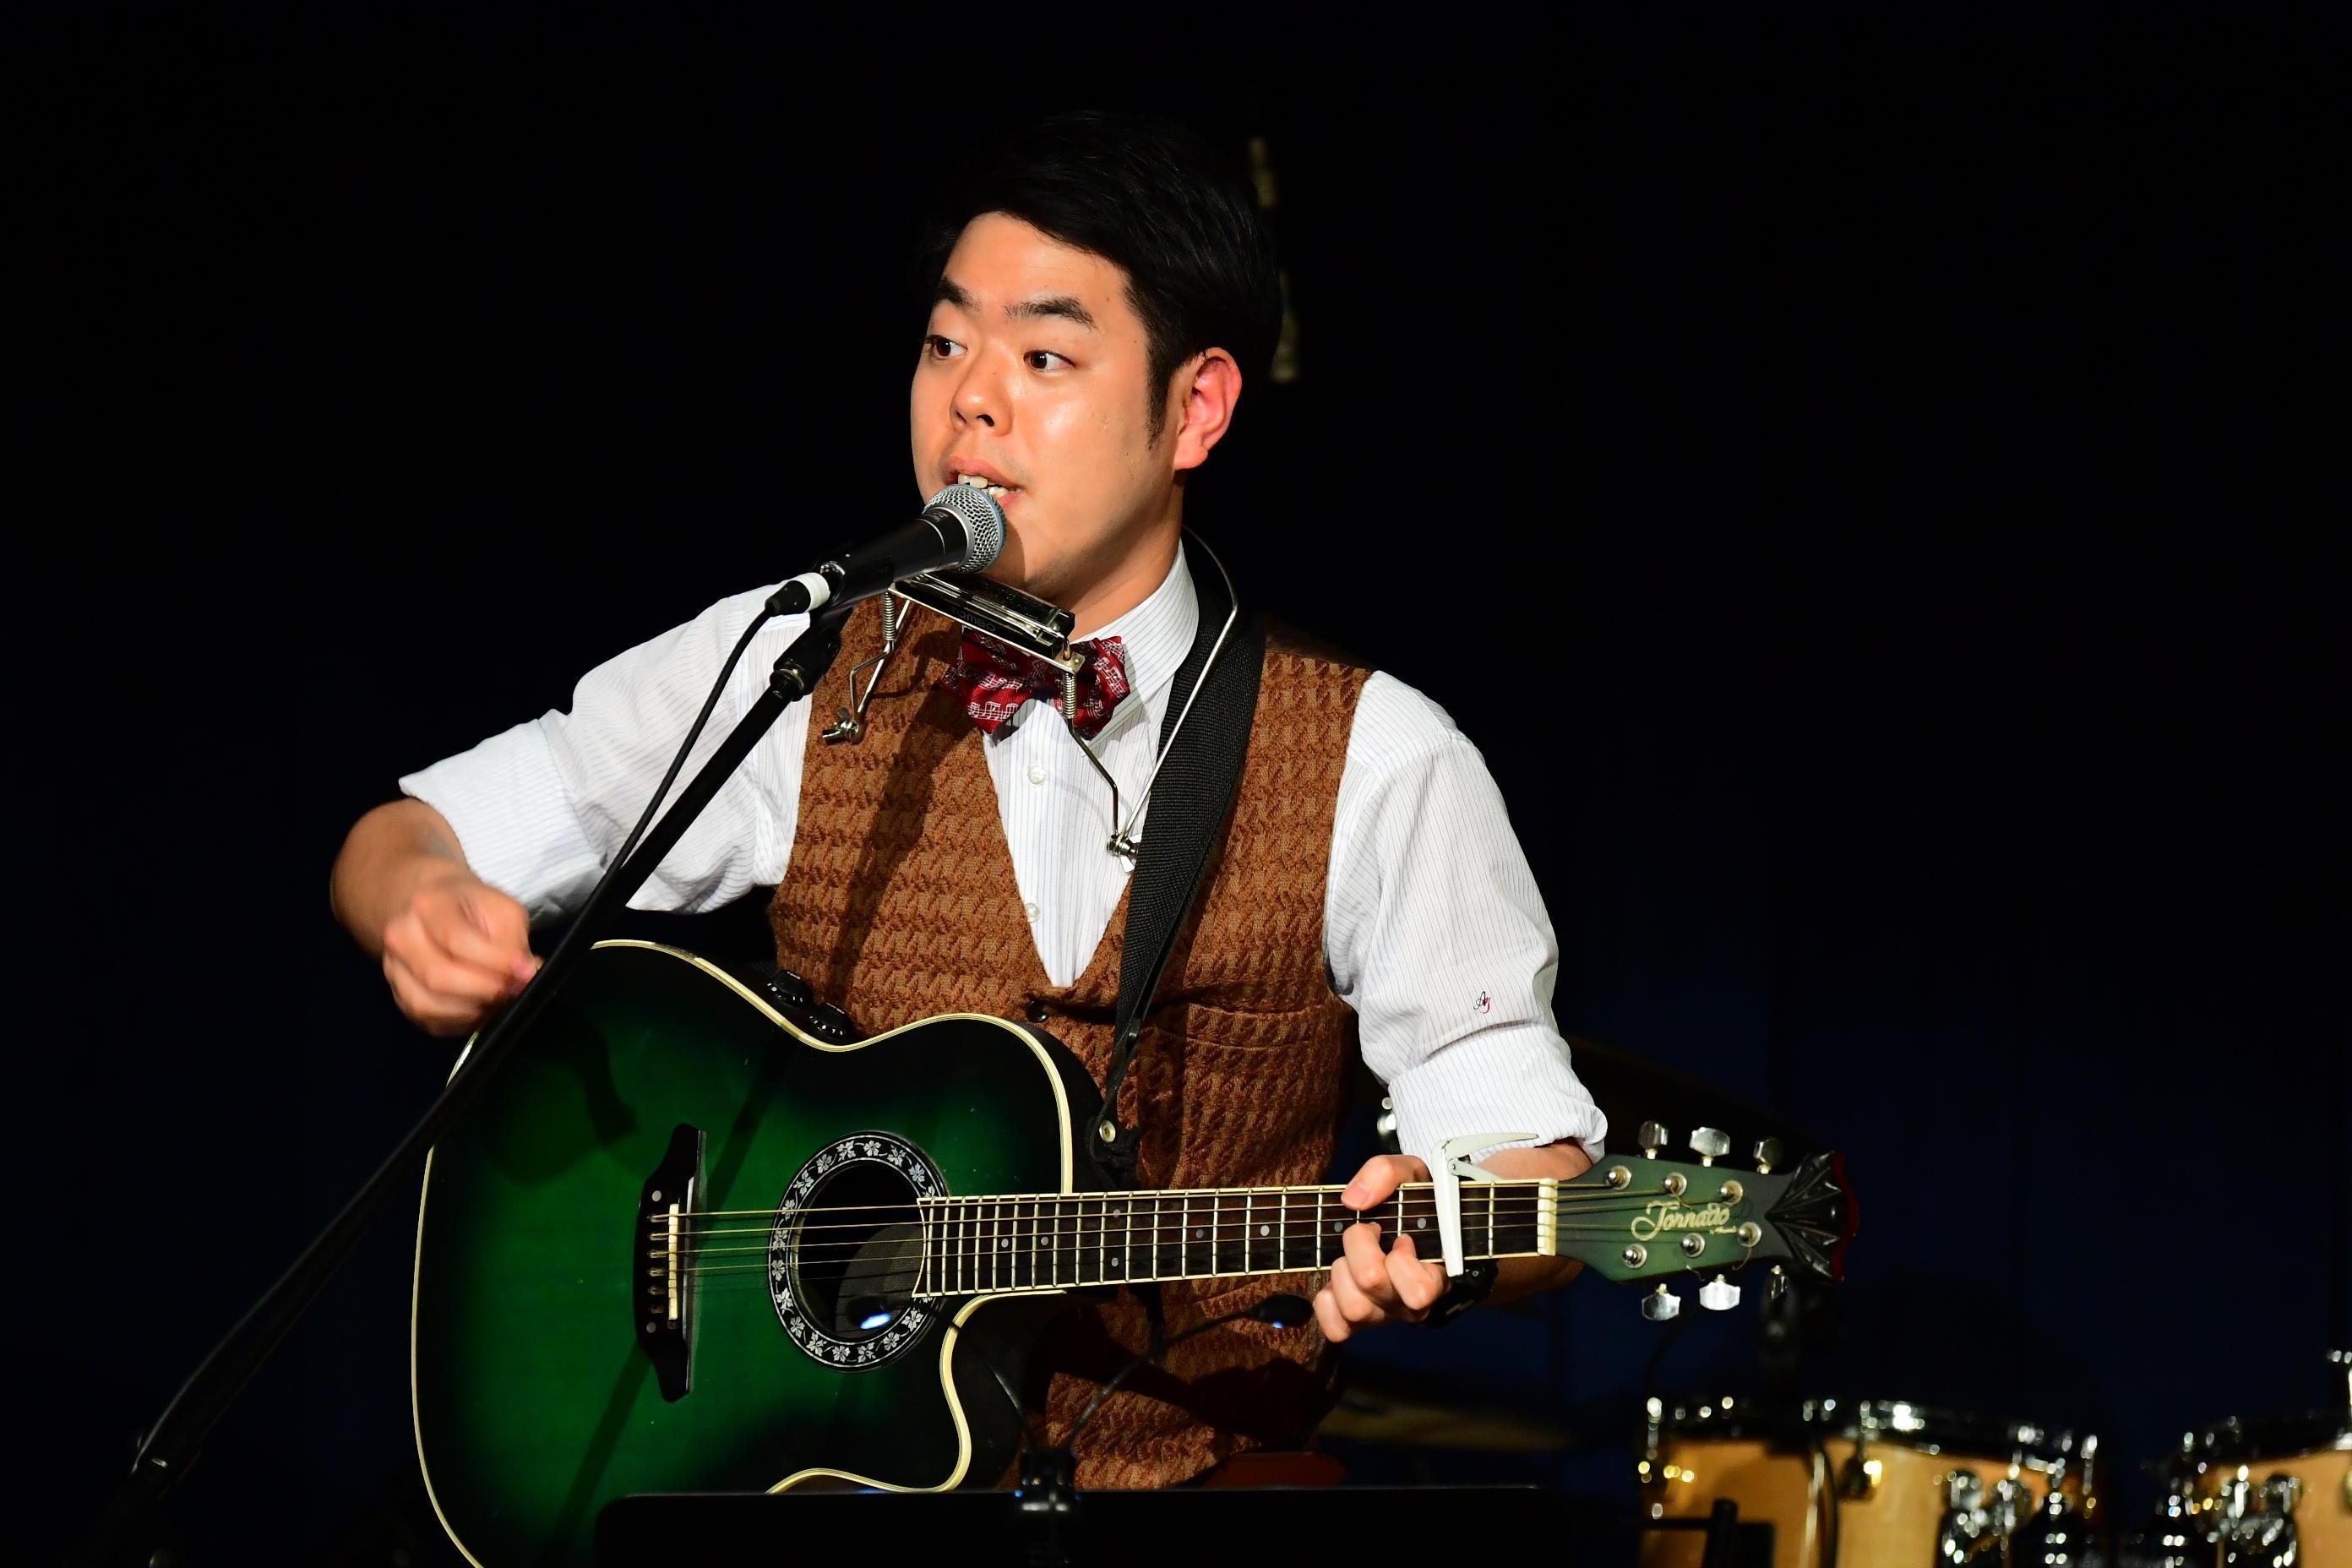 http://news.yoshimoto.co.jp/20170330194952-e0580541f6ccfcf7ec990d557271eb22fd83c51c.jpg